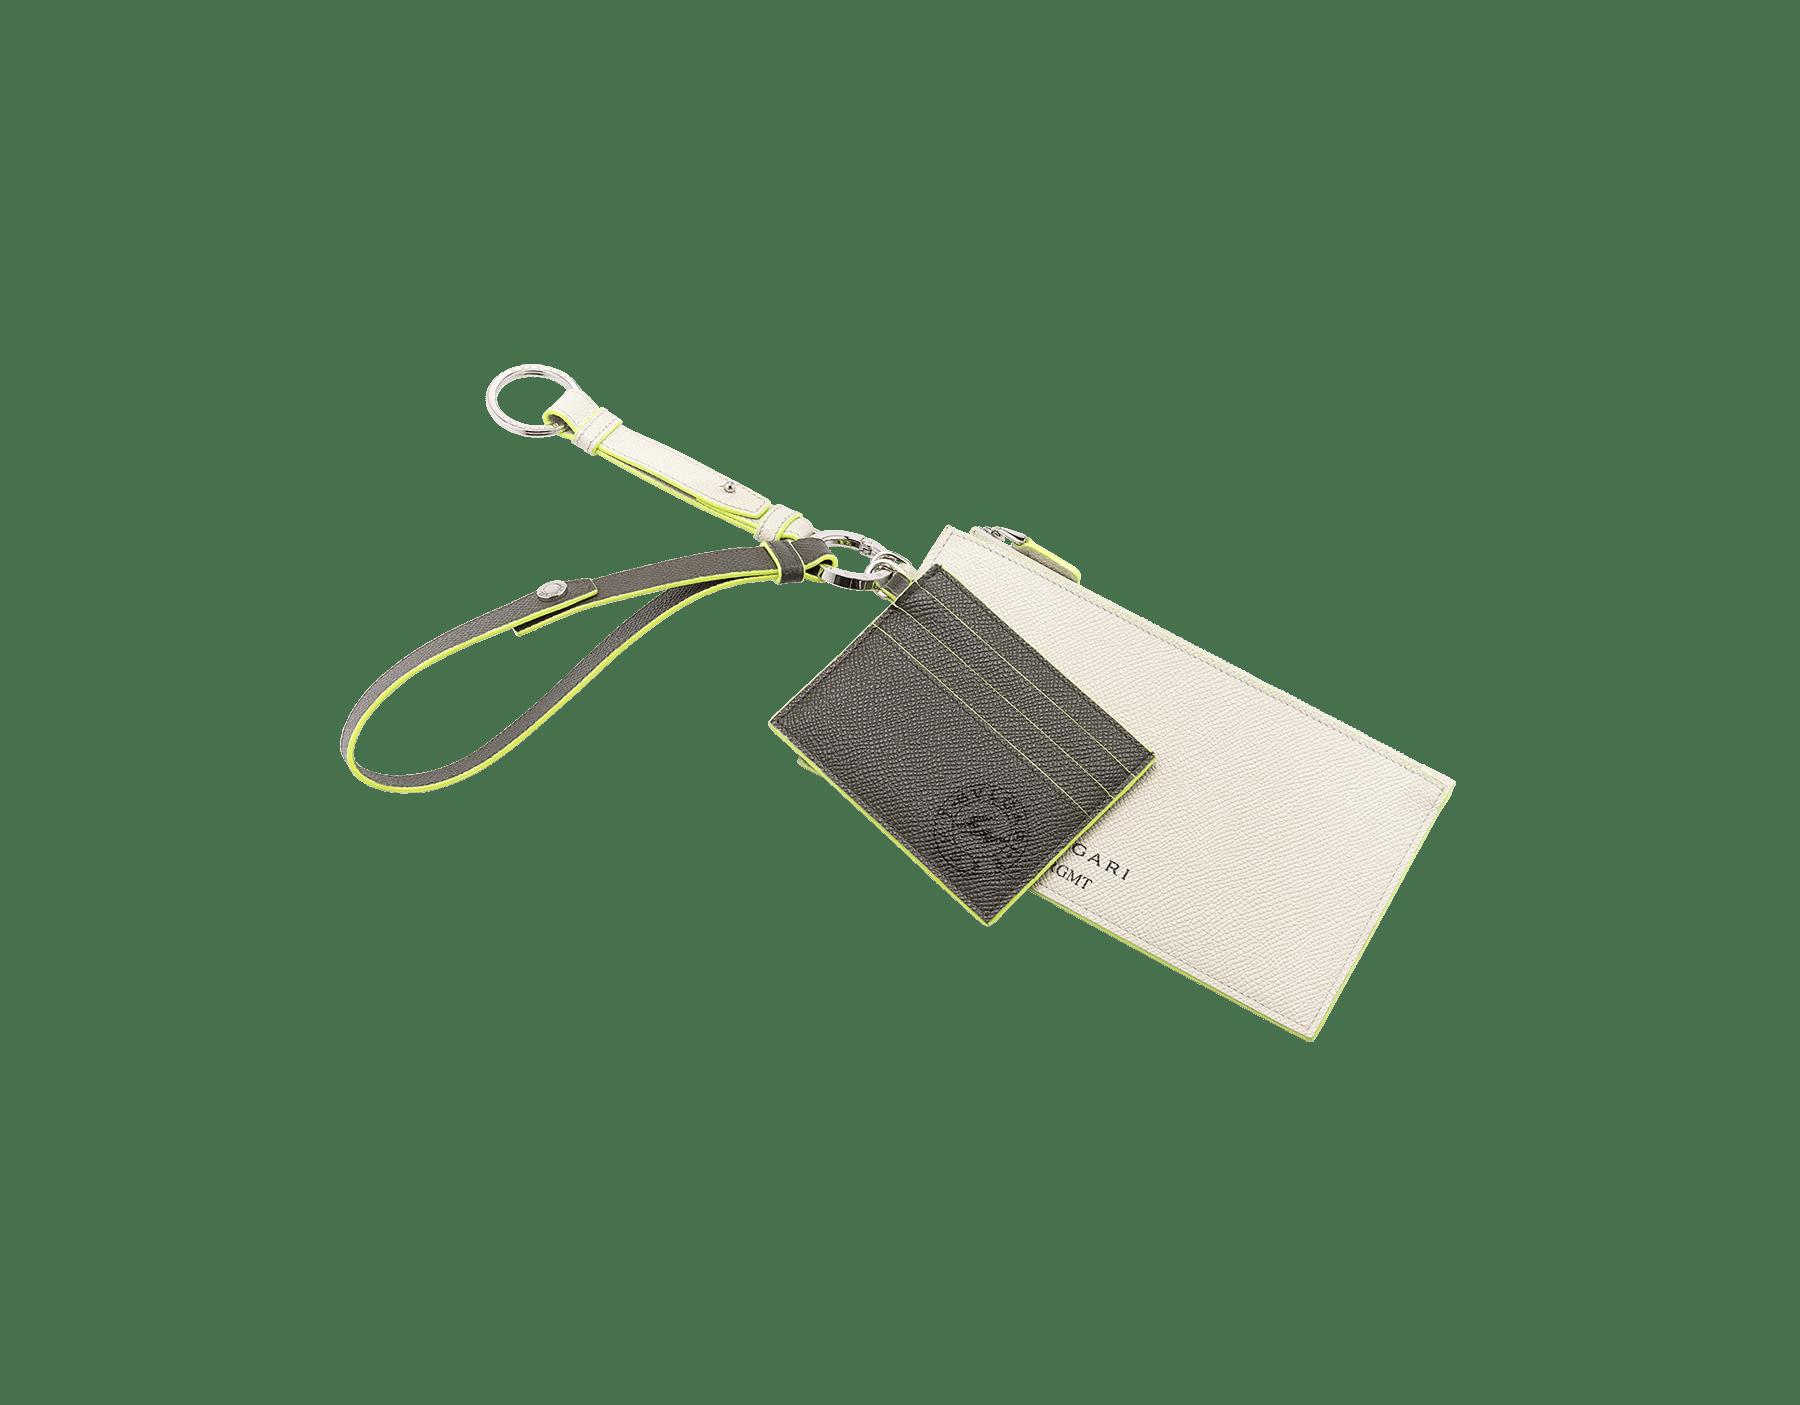 BVLGARI x FRAGMENT by Hiroshi Fujiwara携帯電話・クレジットカードホルダー。 ホークアイ、ホワイトアゲート、蛍光イエローのカーフレザー製。パラジウム プレート ブラスとホワイトアゲートのカーフレザー製キーホルダー。ホークアイのカーフレザー製ストラップ。 289528 image 1